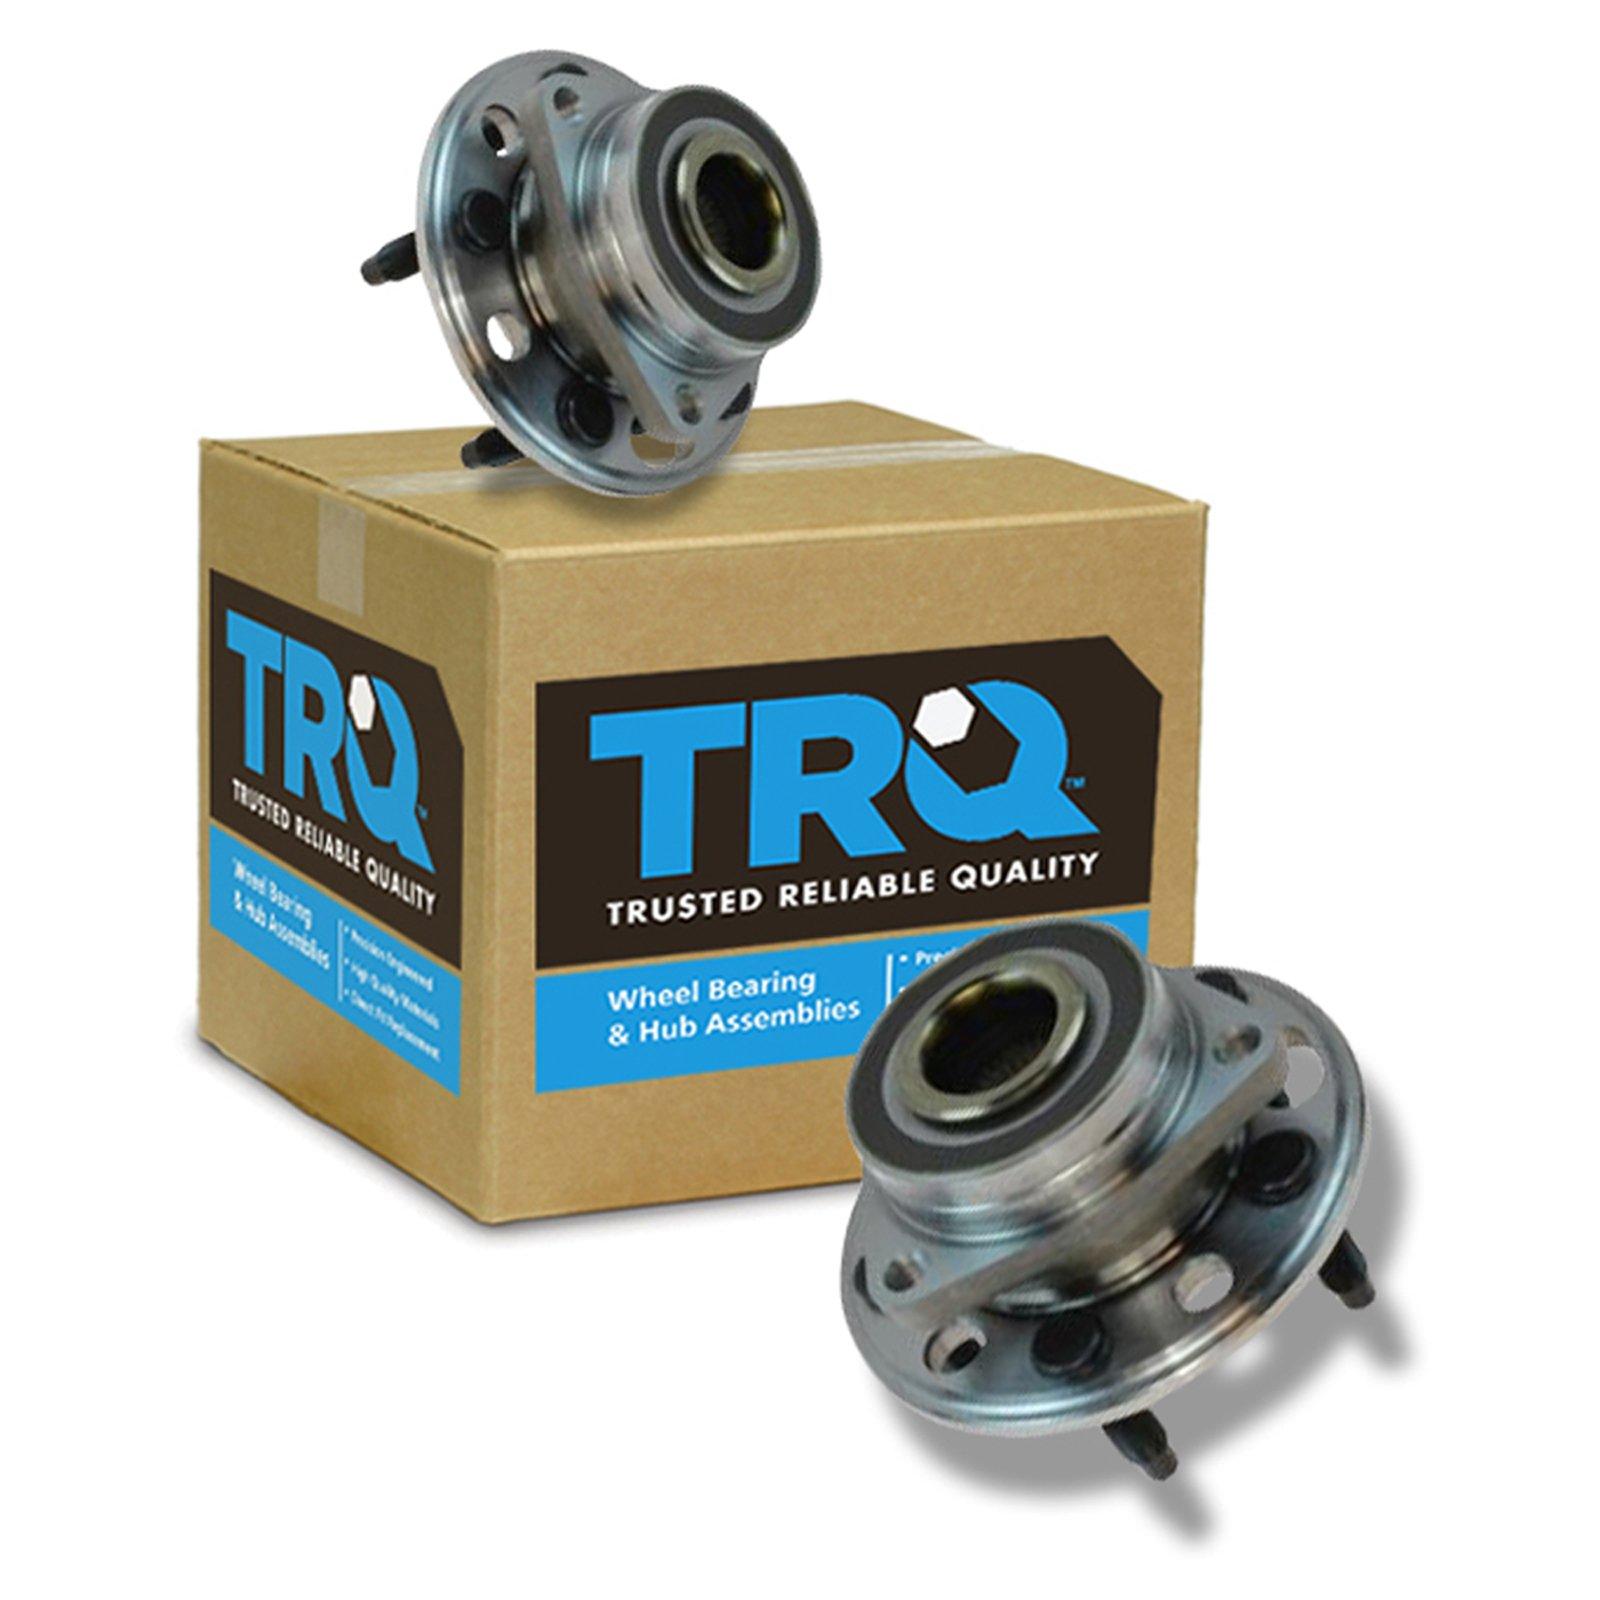 TRQ Wheel Hub & Bearing Assembly Pair Set of 2 for Buick Chevy GMC Saab by TRQ